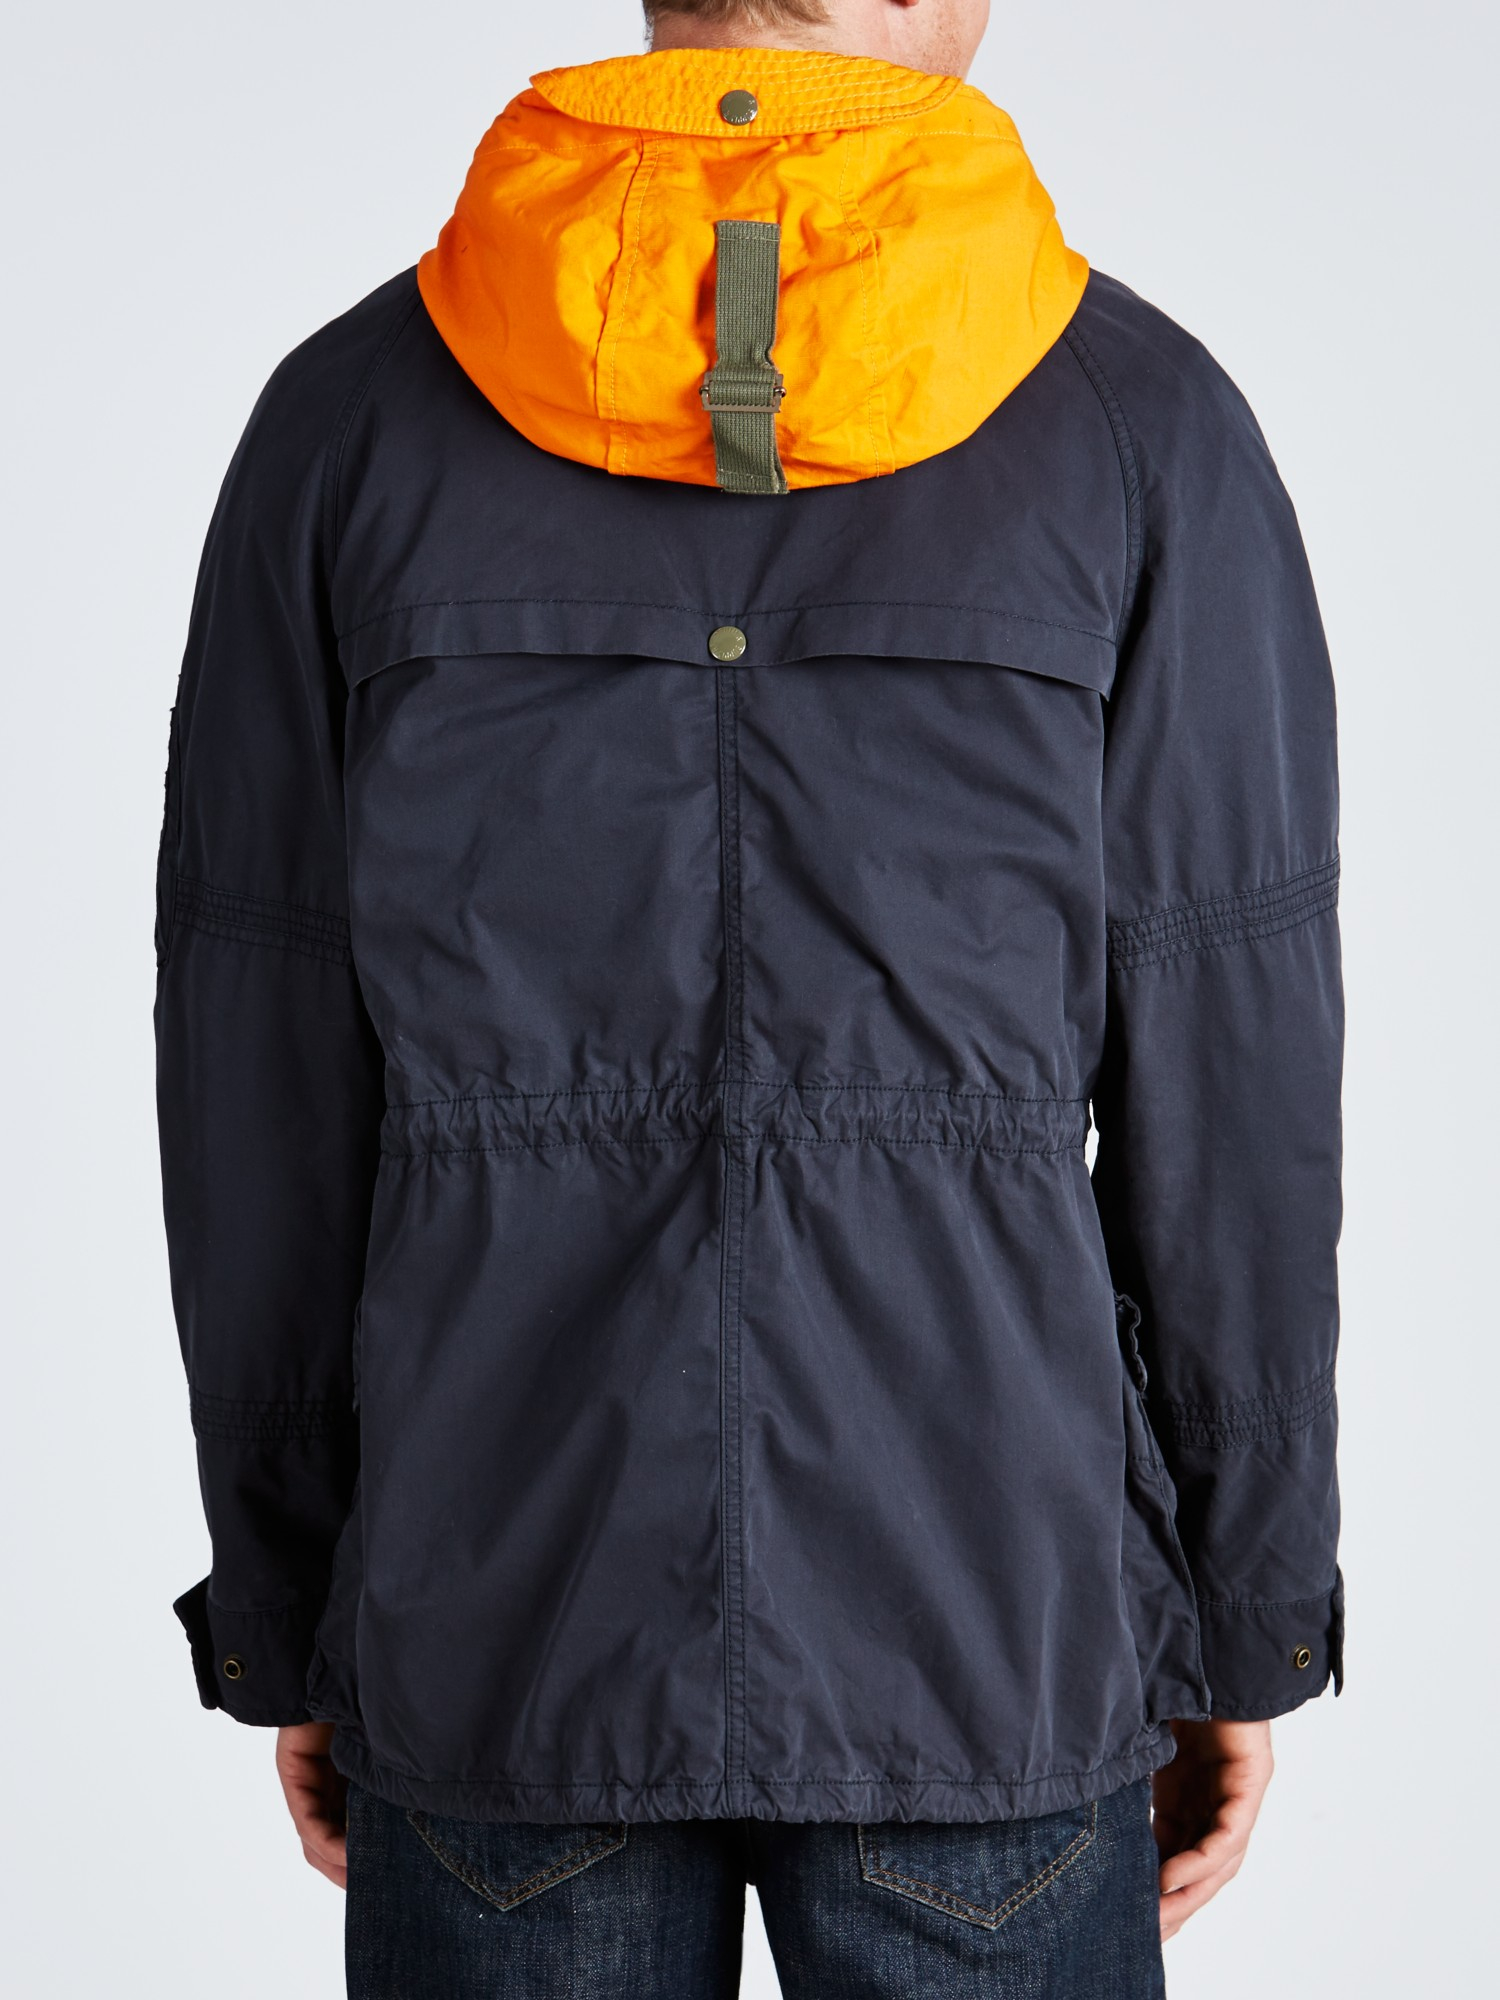 bfa17990f0 ralph lauren nautical jacket New Ralph Lauren RRL Cotton   Linen ...